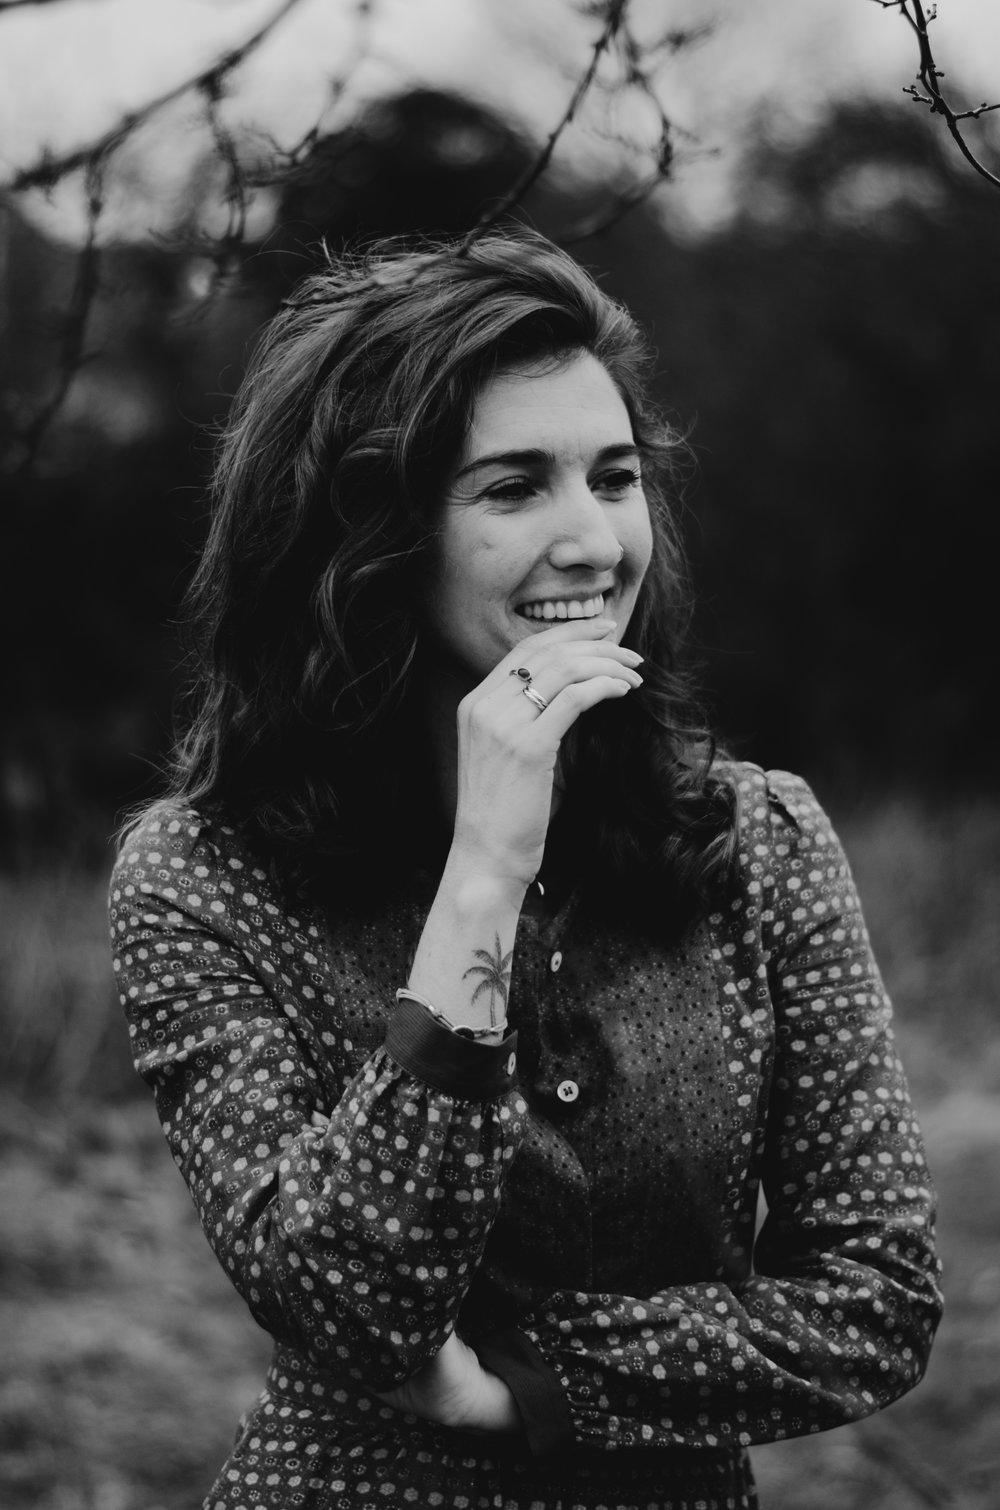 Chloe - Portraits - Aiste Saulyte Photography - 2018-01-05-76.jpg